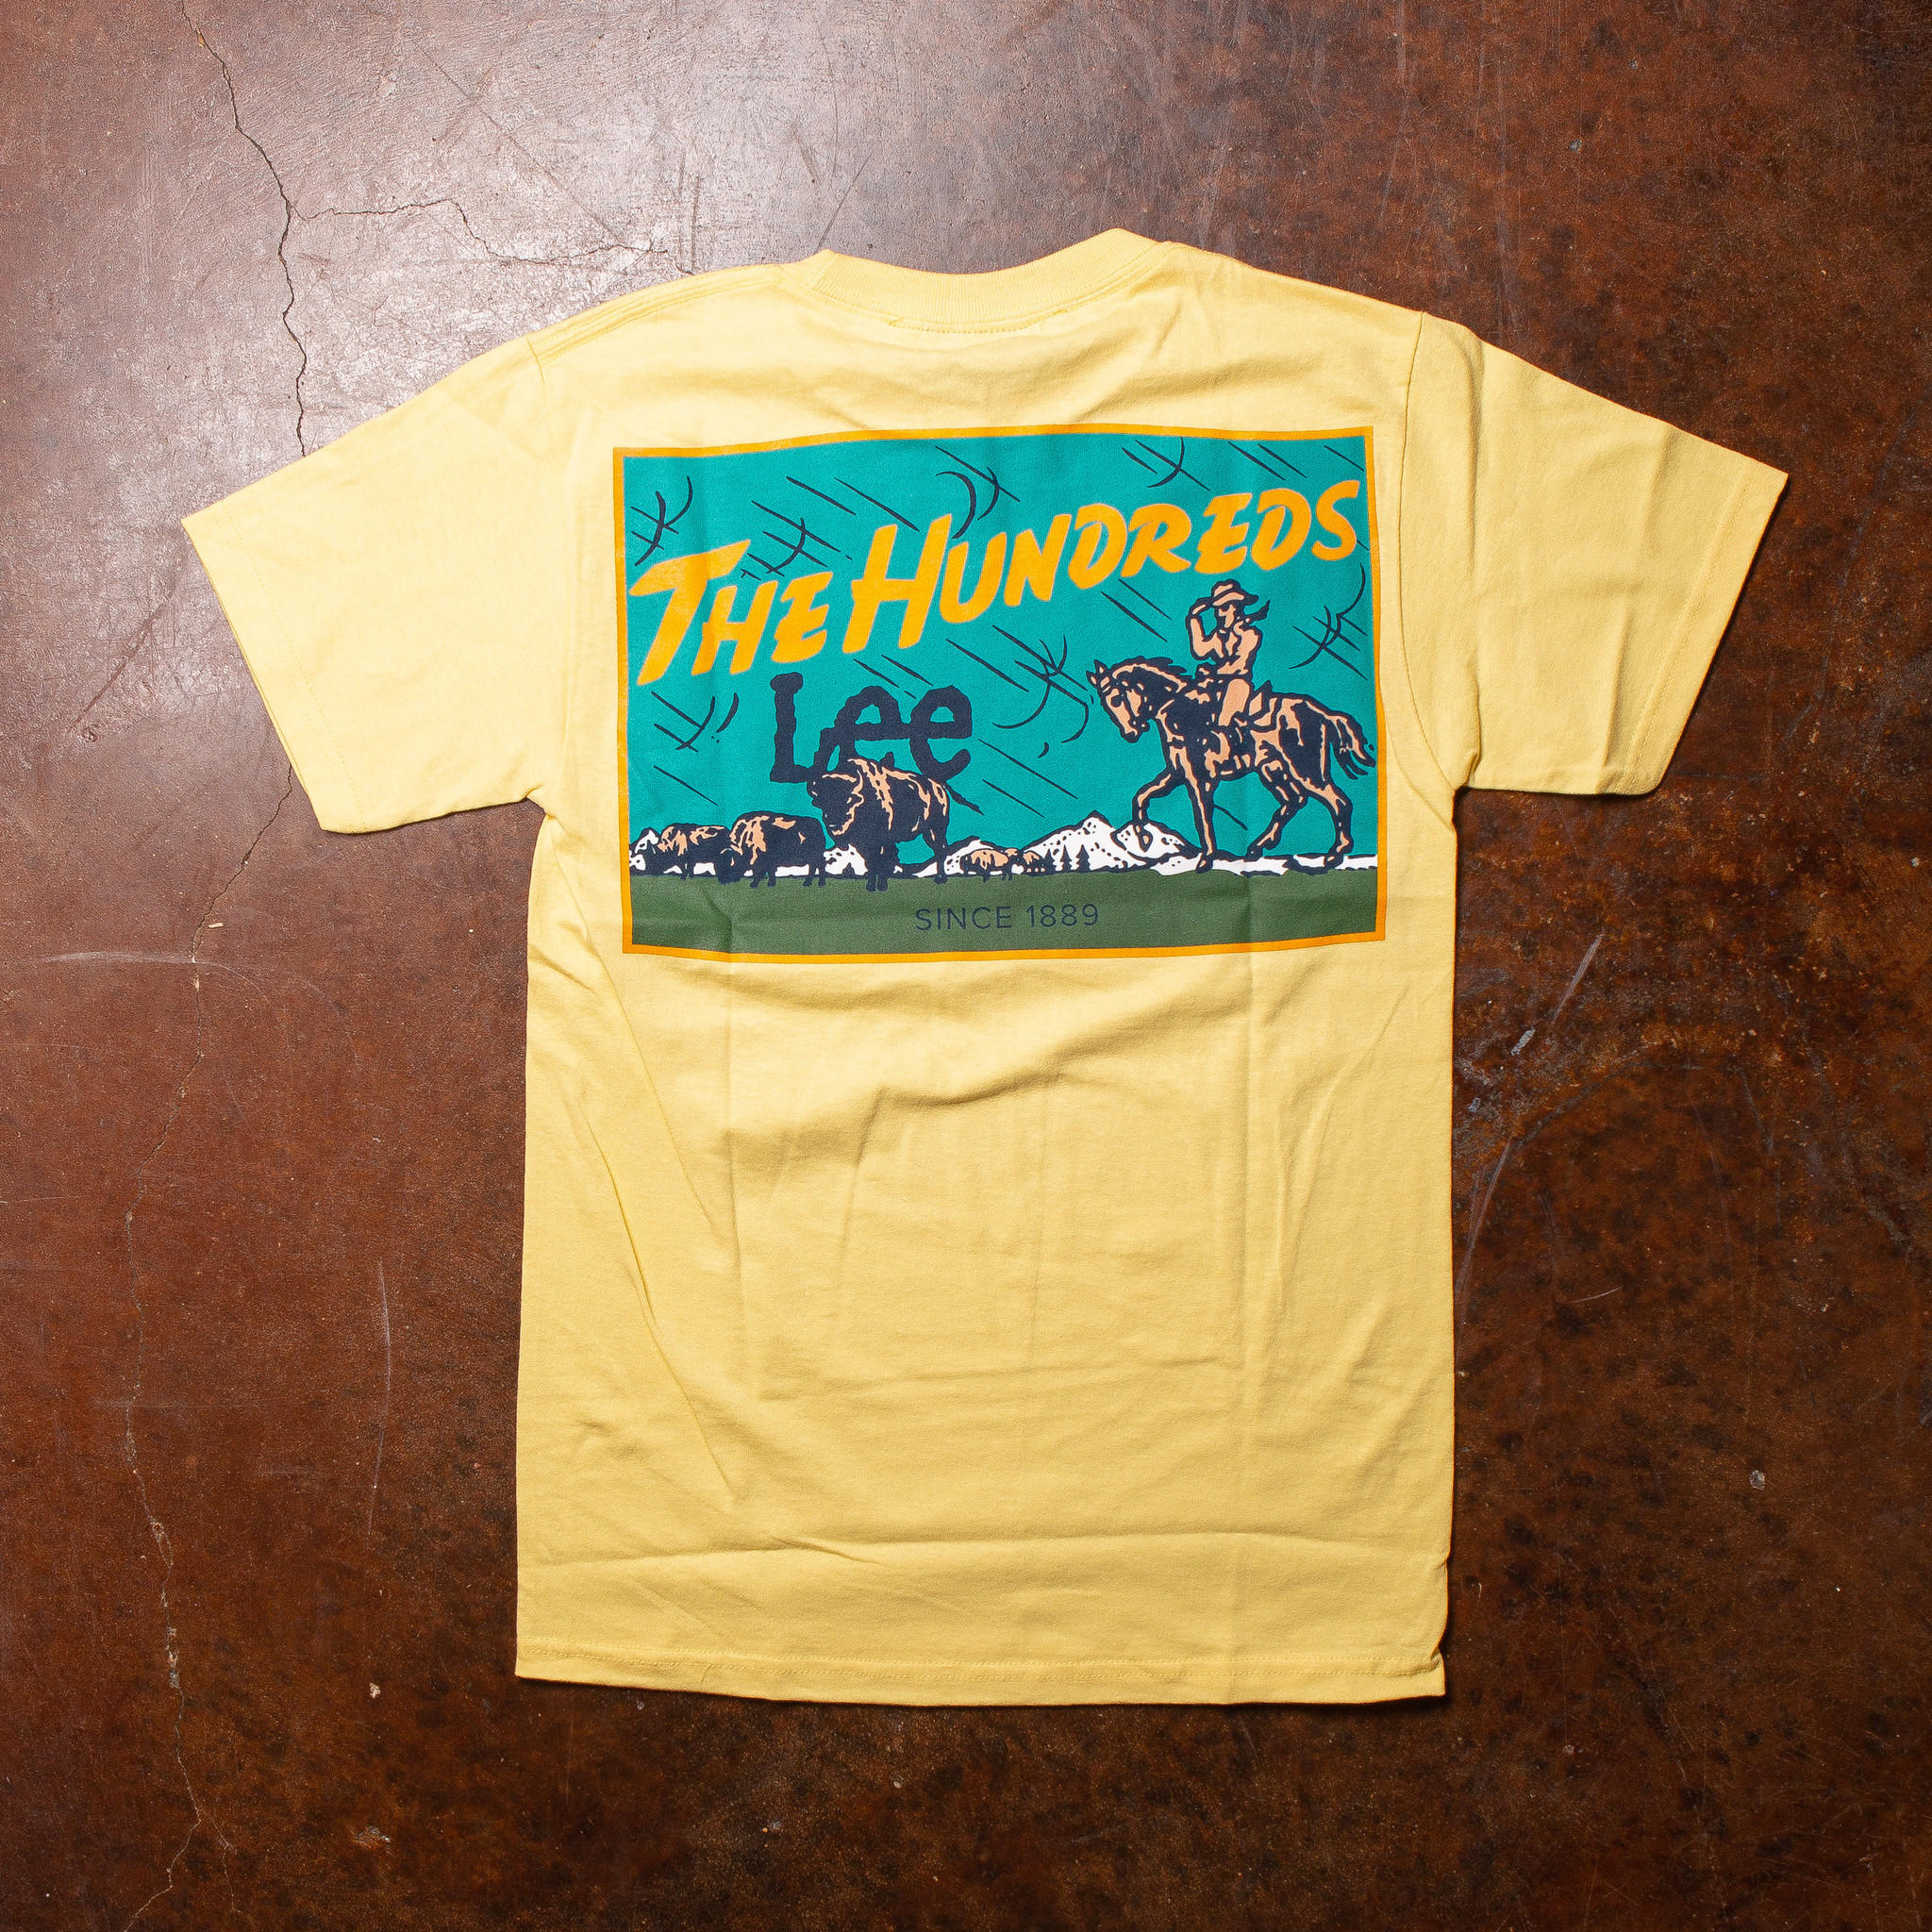 The Hundreds The Hundreds x Lee Jeans Storm Rider Tee Banana